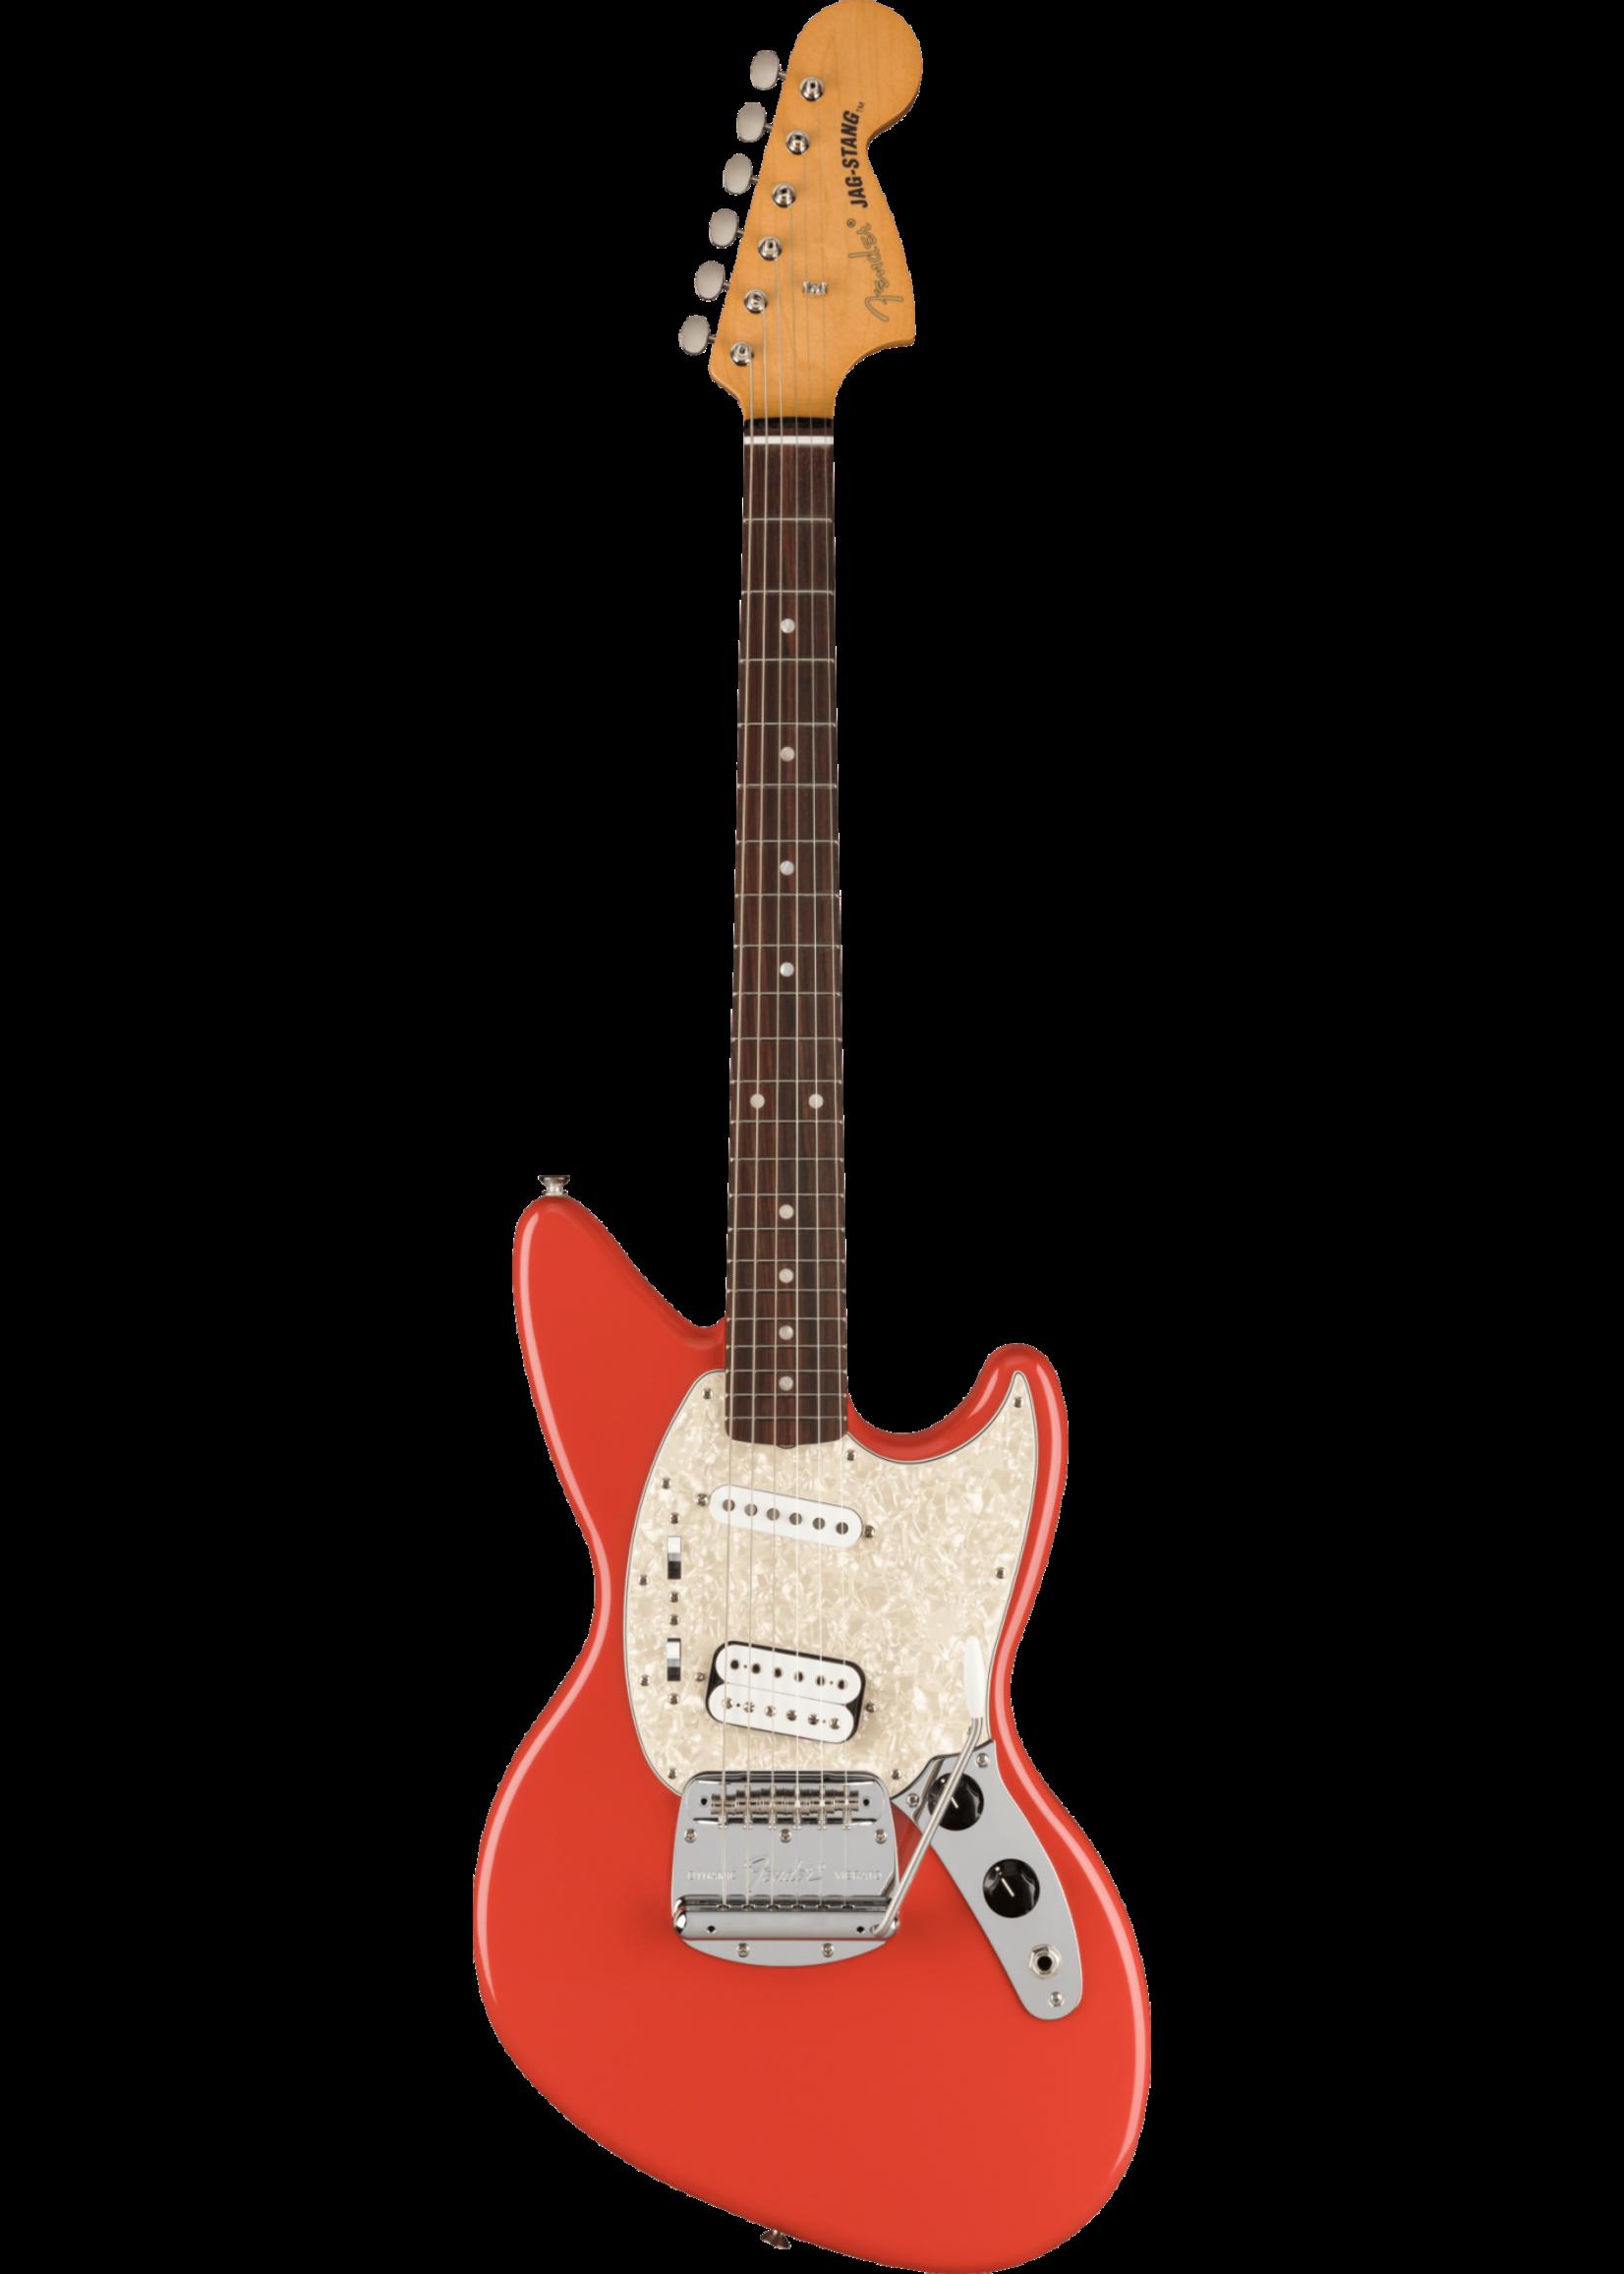 Fender Fender Kurt Cobain Jag-Stang Fiesta Red